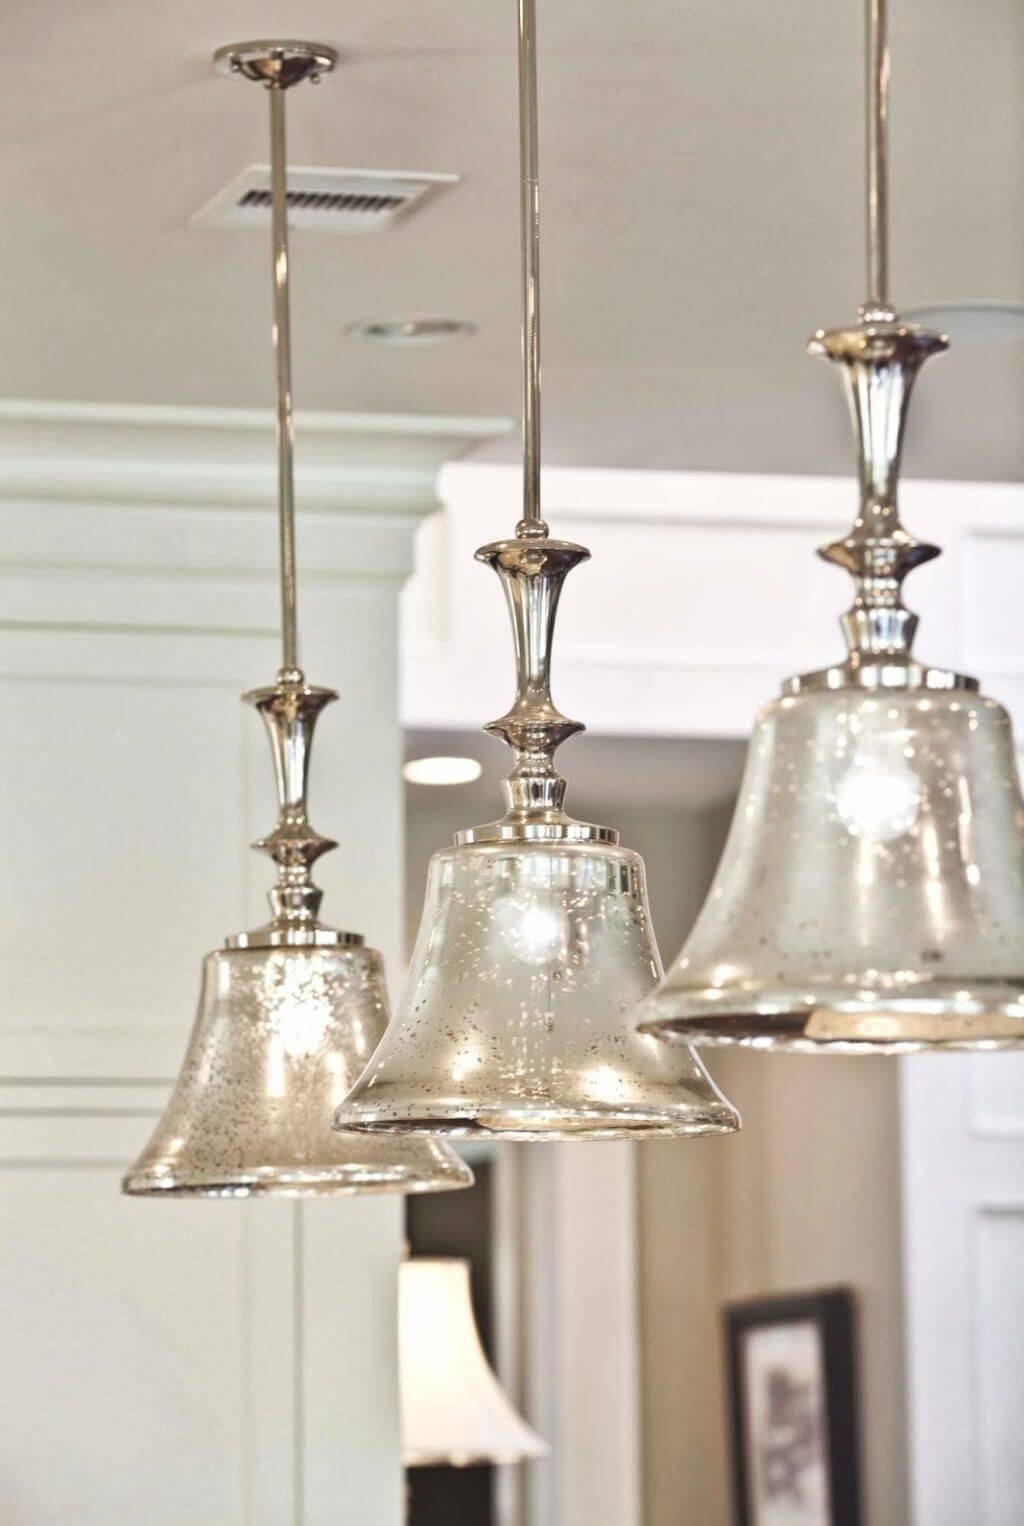 restoration hardware pendant lighting fixtures. vintage glass pendant light - baby-exit pertaining to restoration hardware lights (image lighting fixtures t